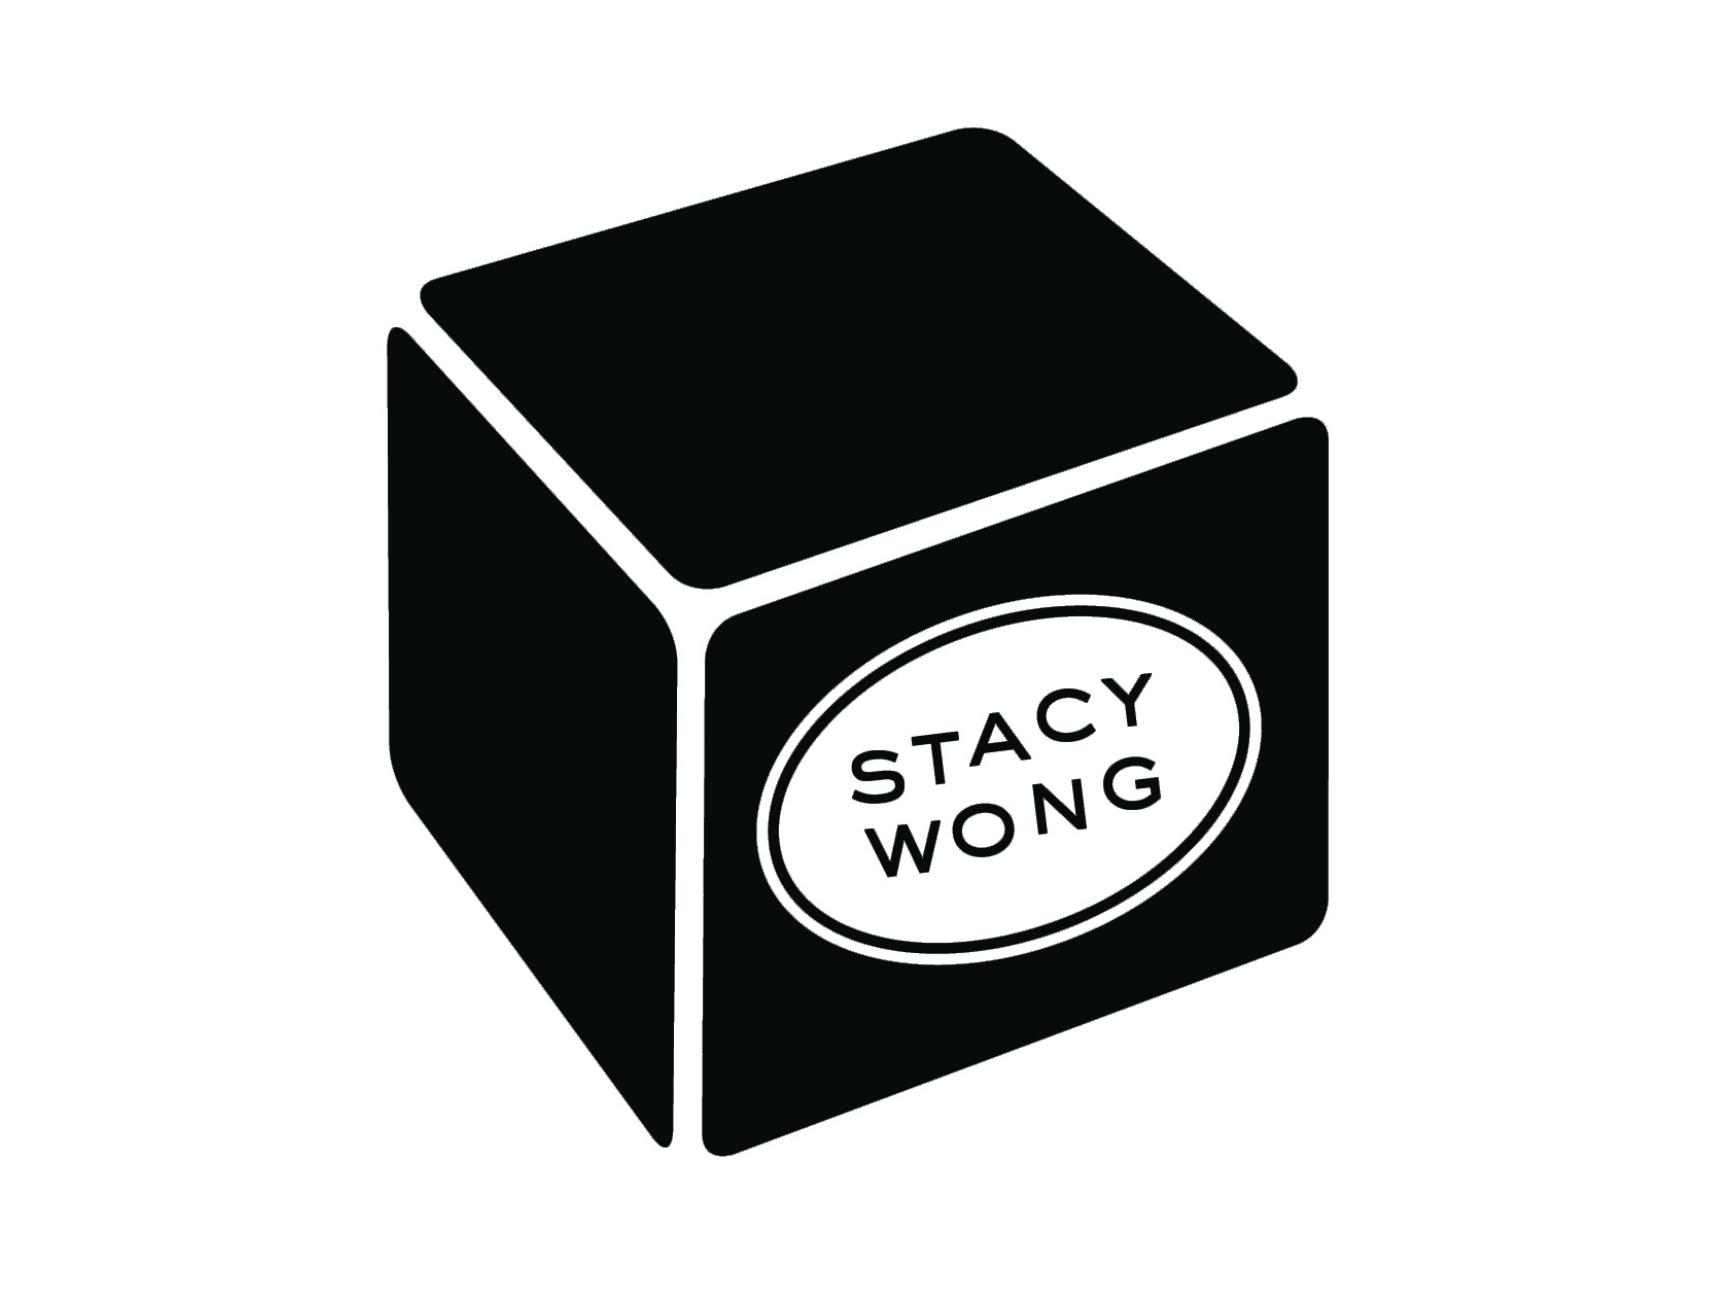 Stacy-Wong-B+W-Logo-24x18.jpg